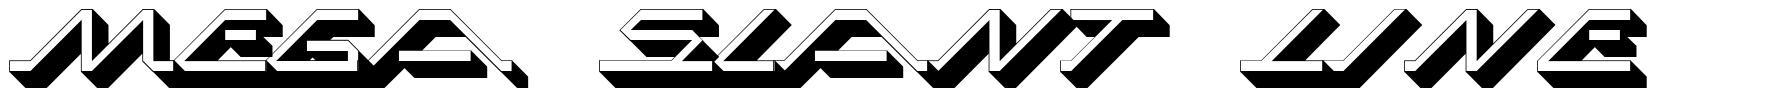 Mega Slant Line font